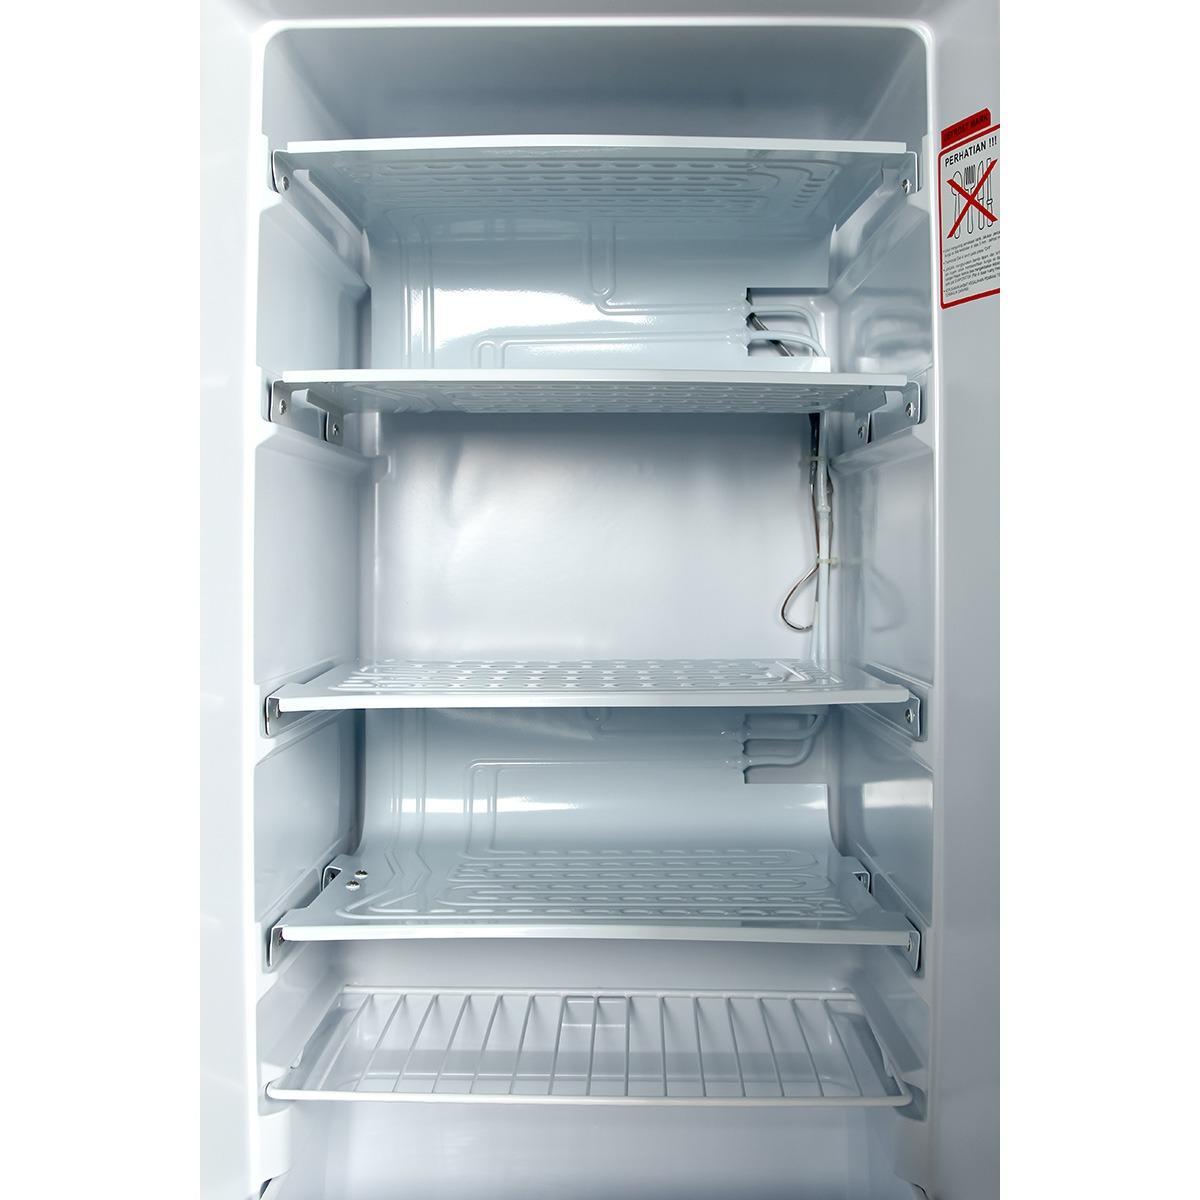 Cek Harga Baru Aqua Sanyo Aqf S4 Freezer 4rak Free Ongkir Khusus Mesin Cuci 2 Tabung 12 Kg Qw 1280xt Area Jabodetabek 3